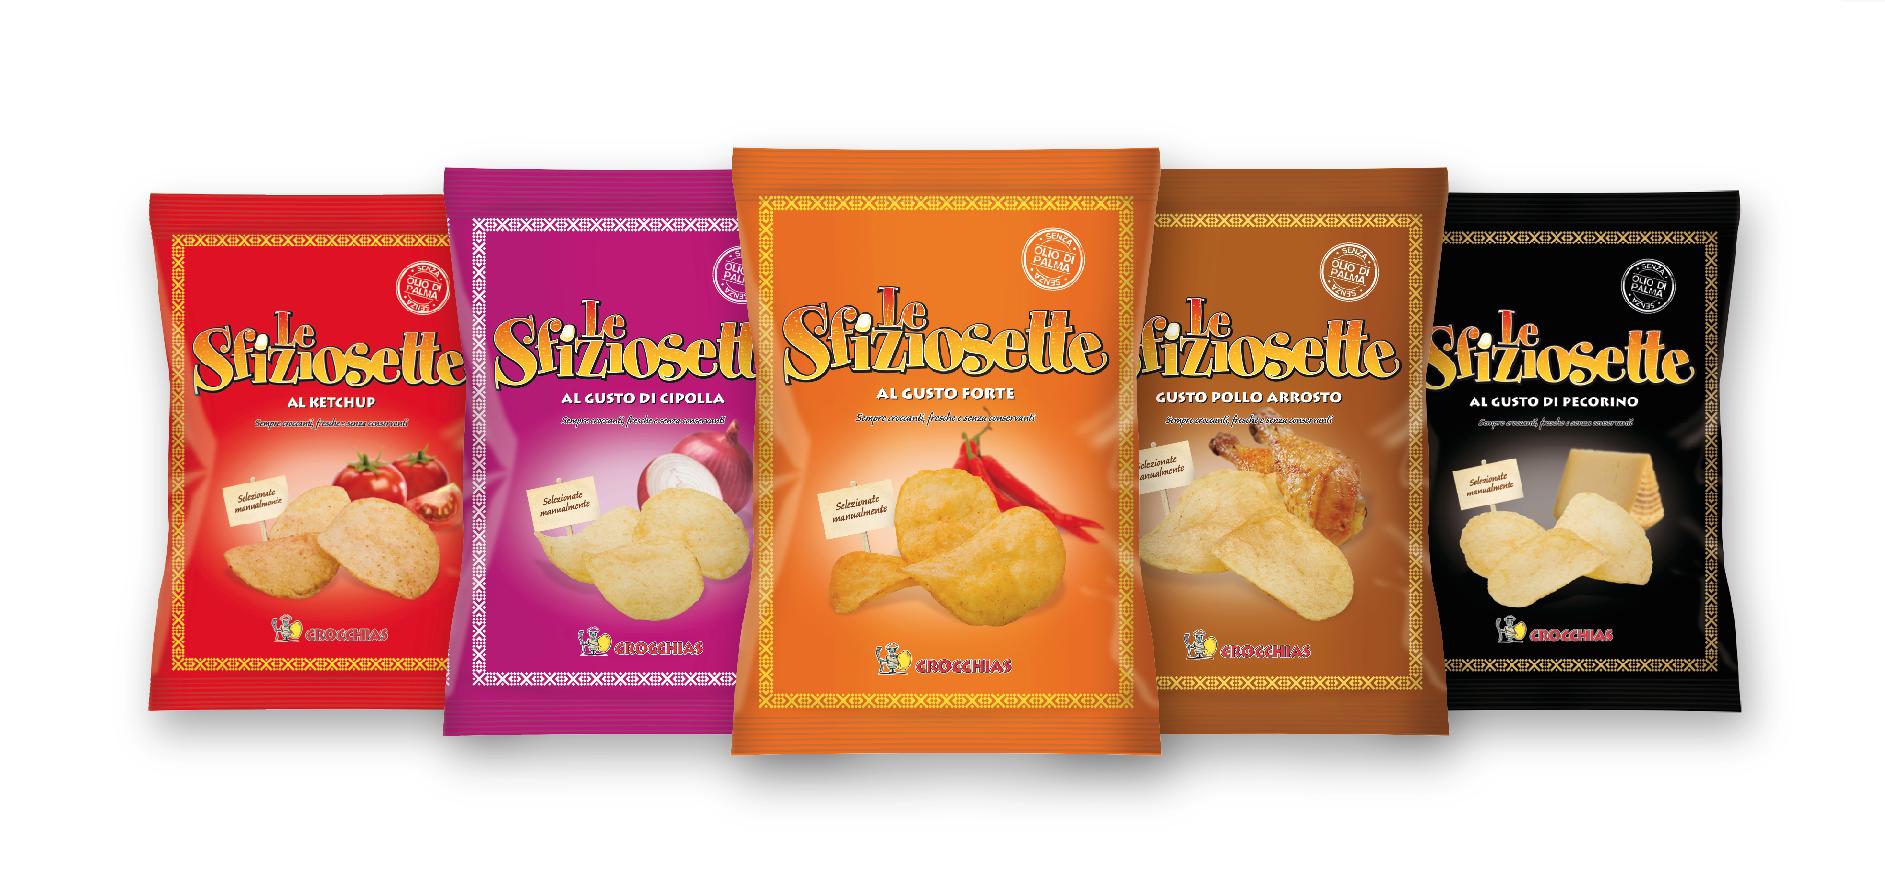 sfiziosette_pack_linea